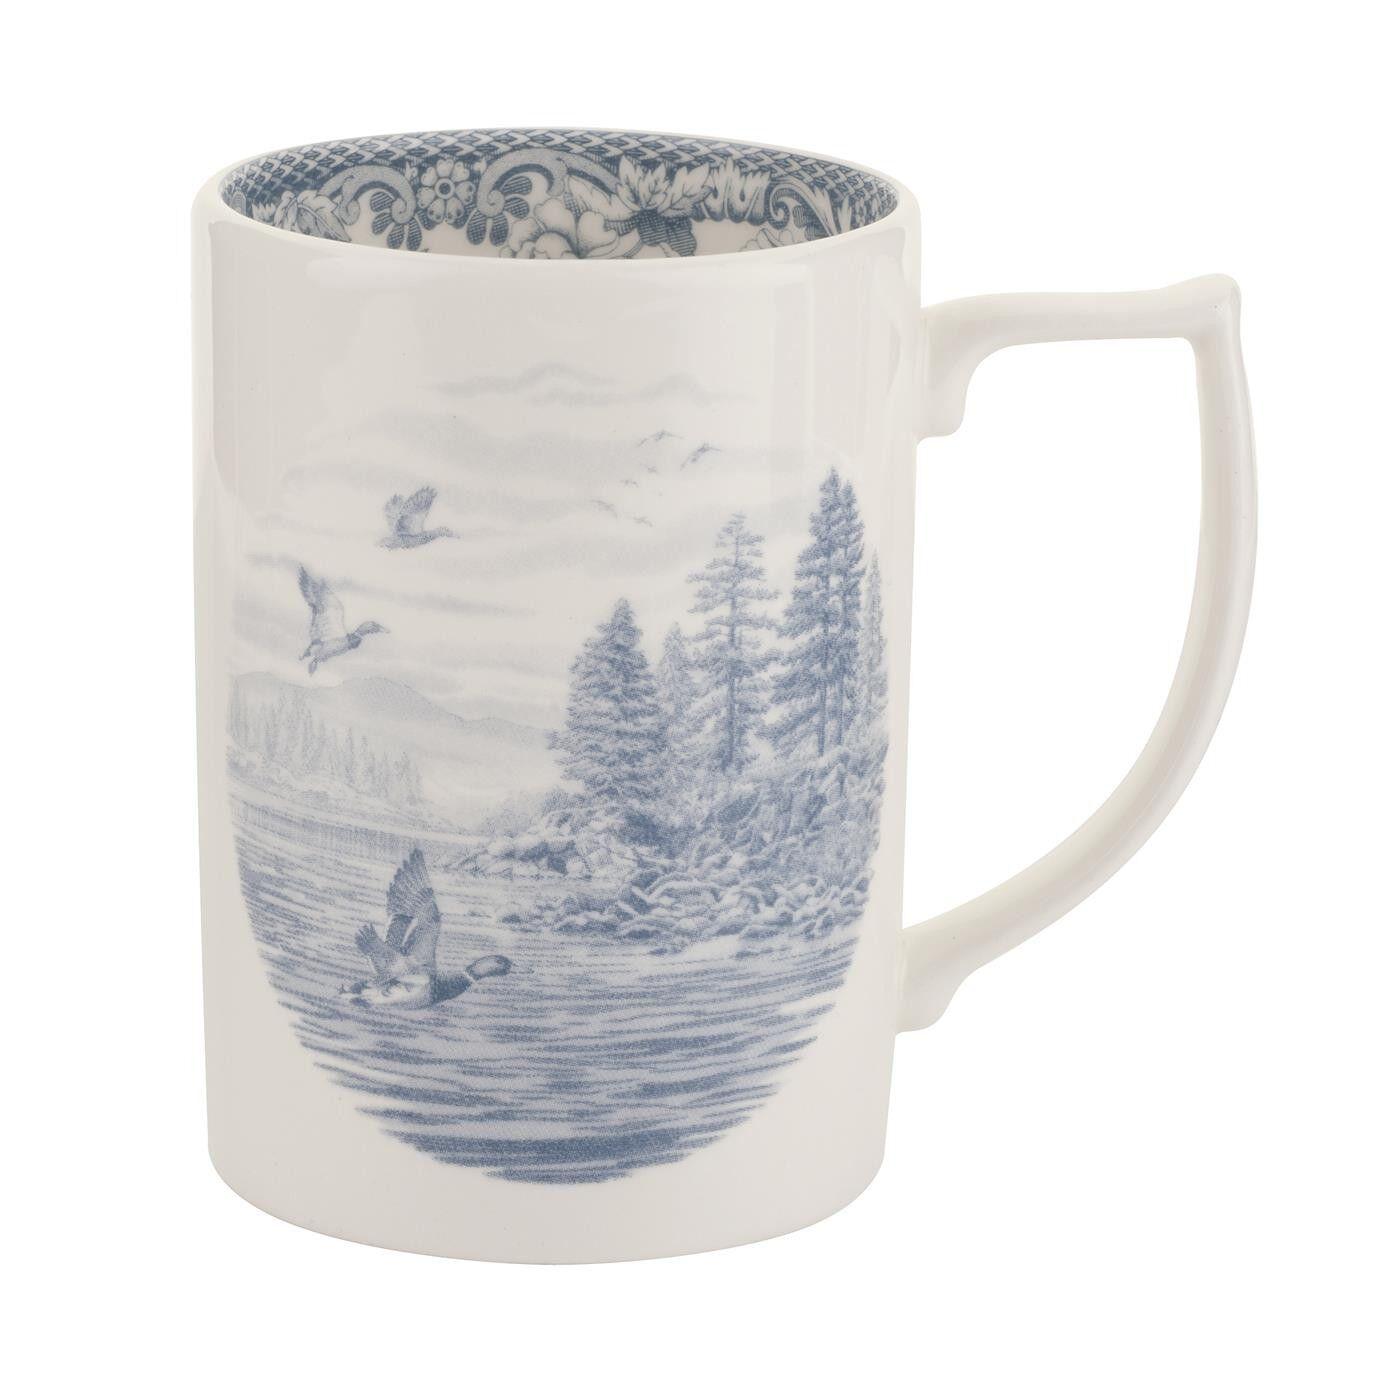 Spode Delamere Lakeside Mug